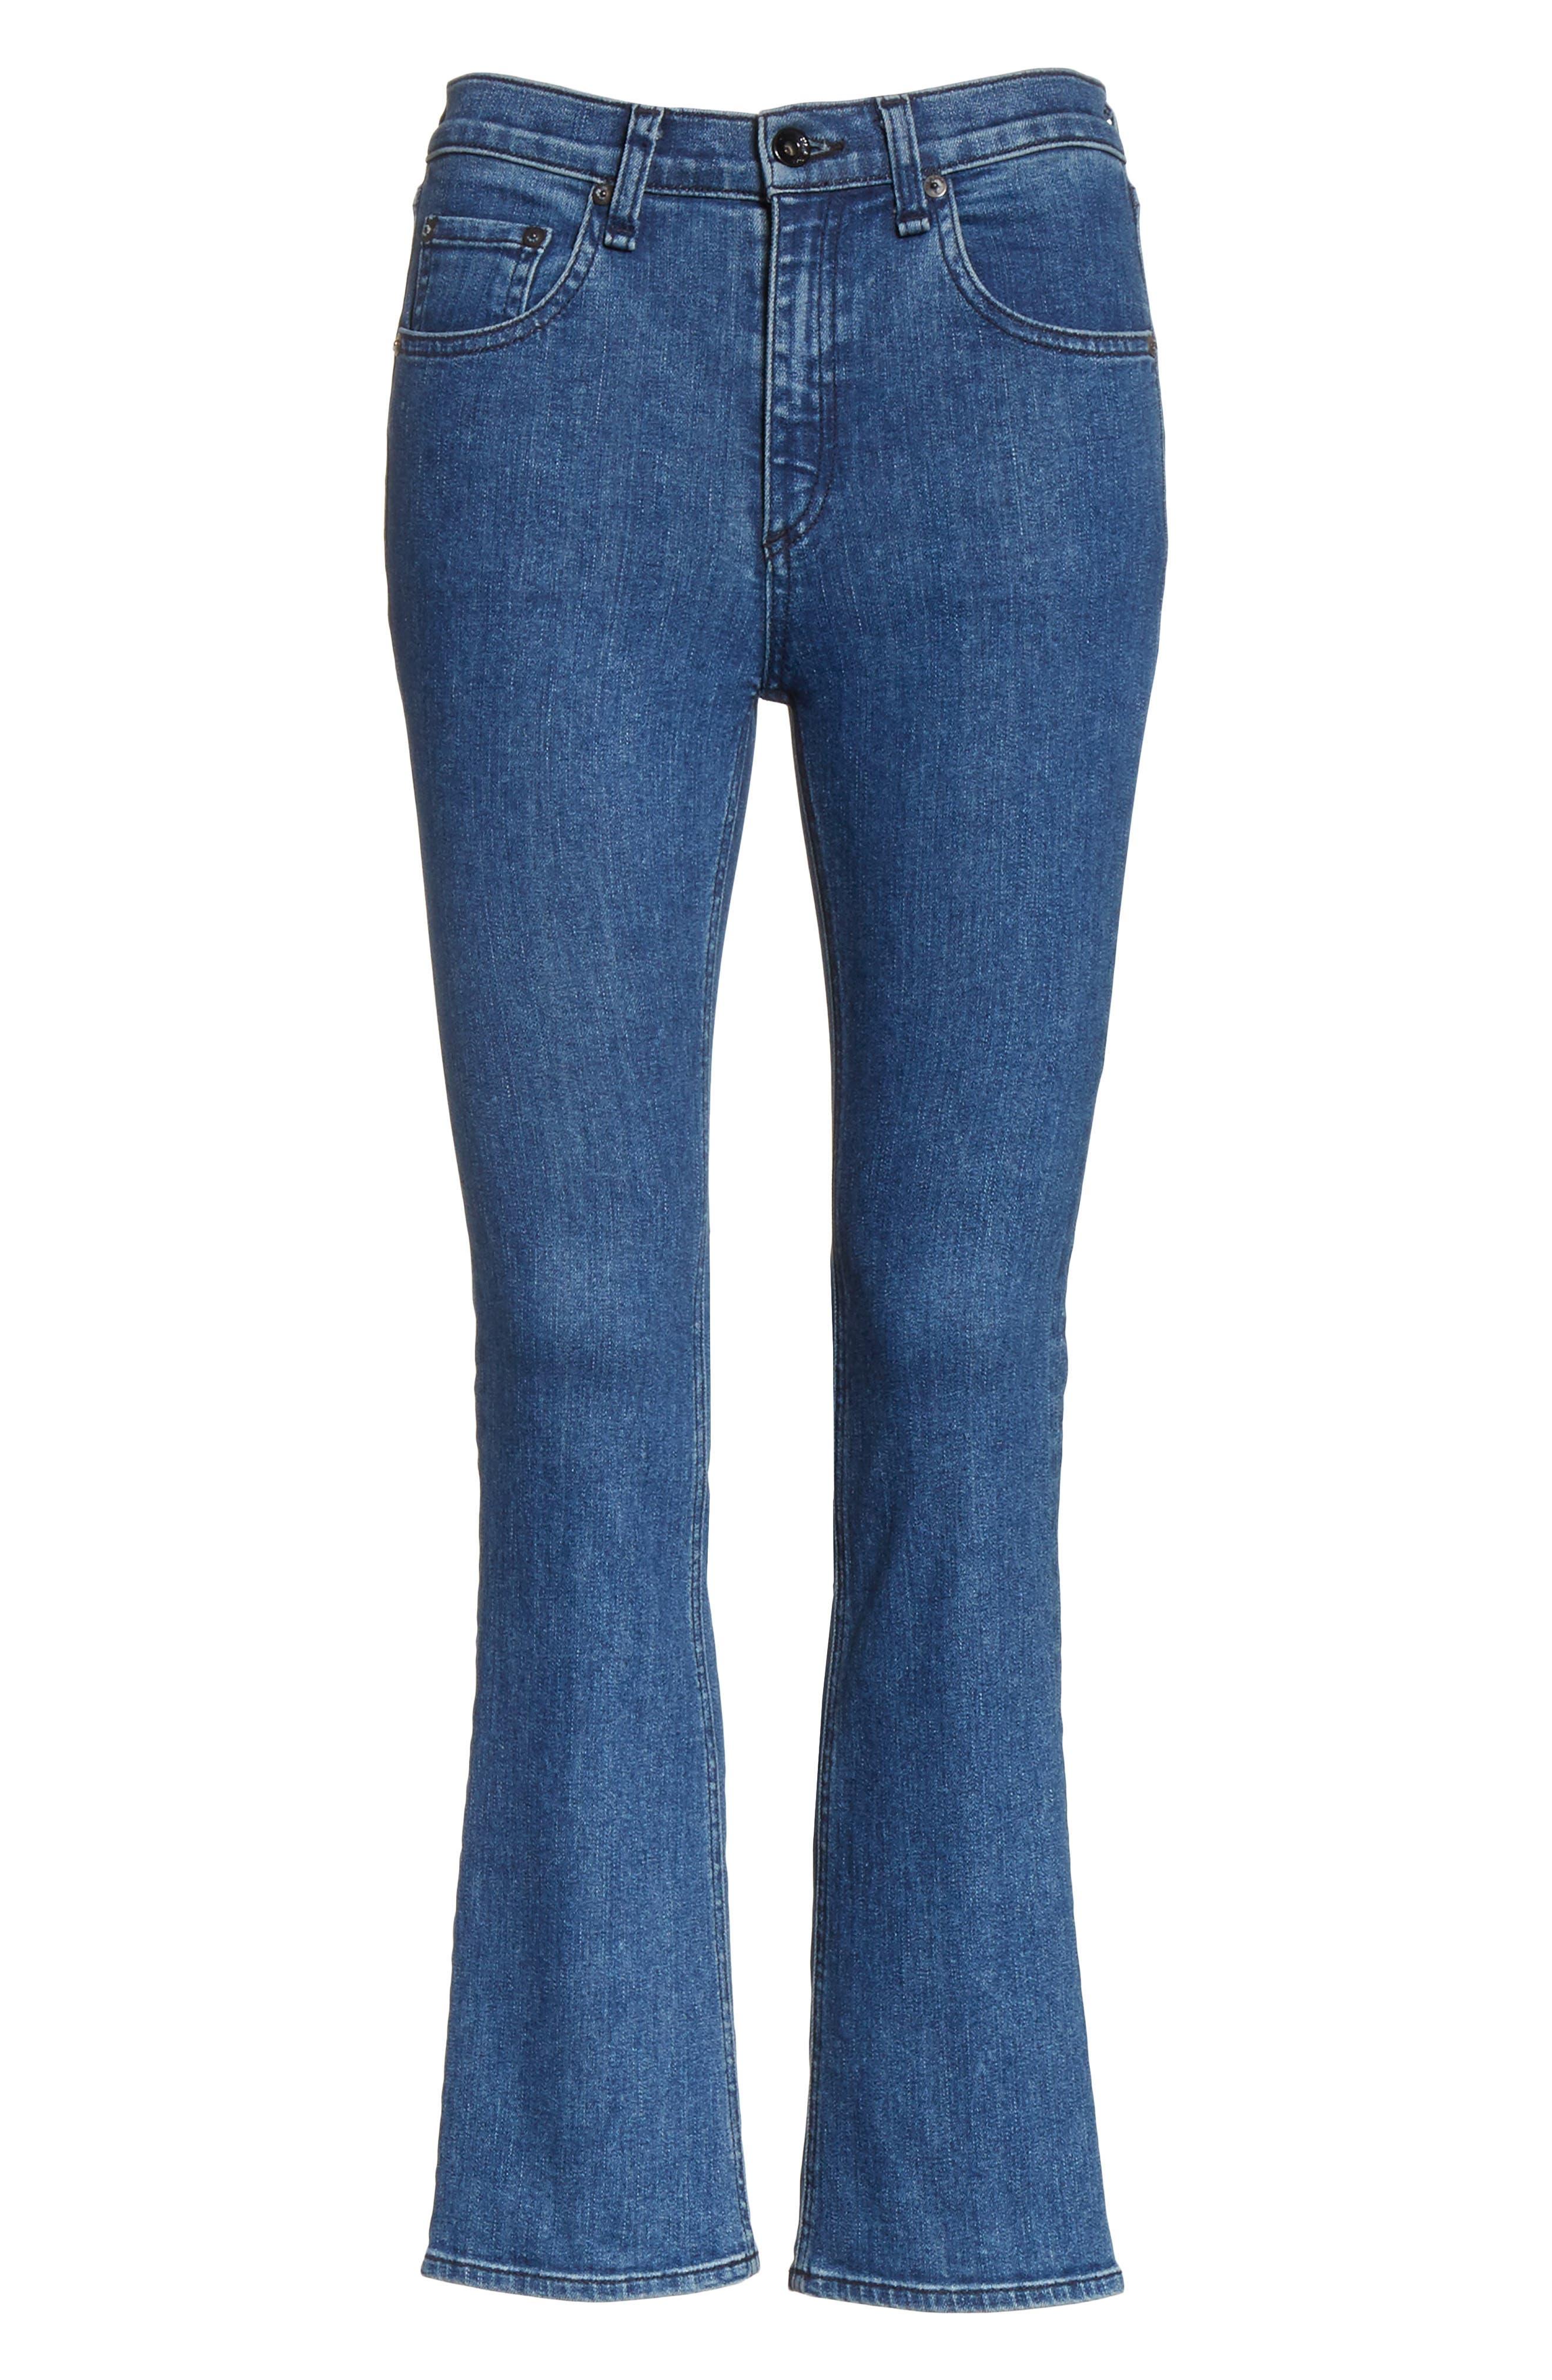 Hana High Waist Crop Bootcut Jeans,                             Alternate thumbnail 6, color,                             420